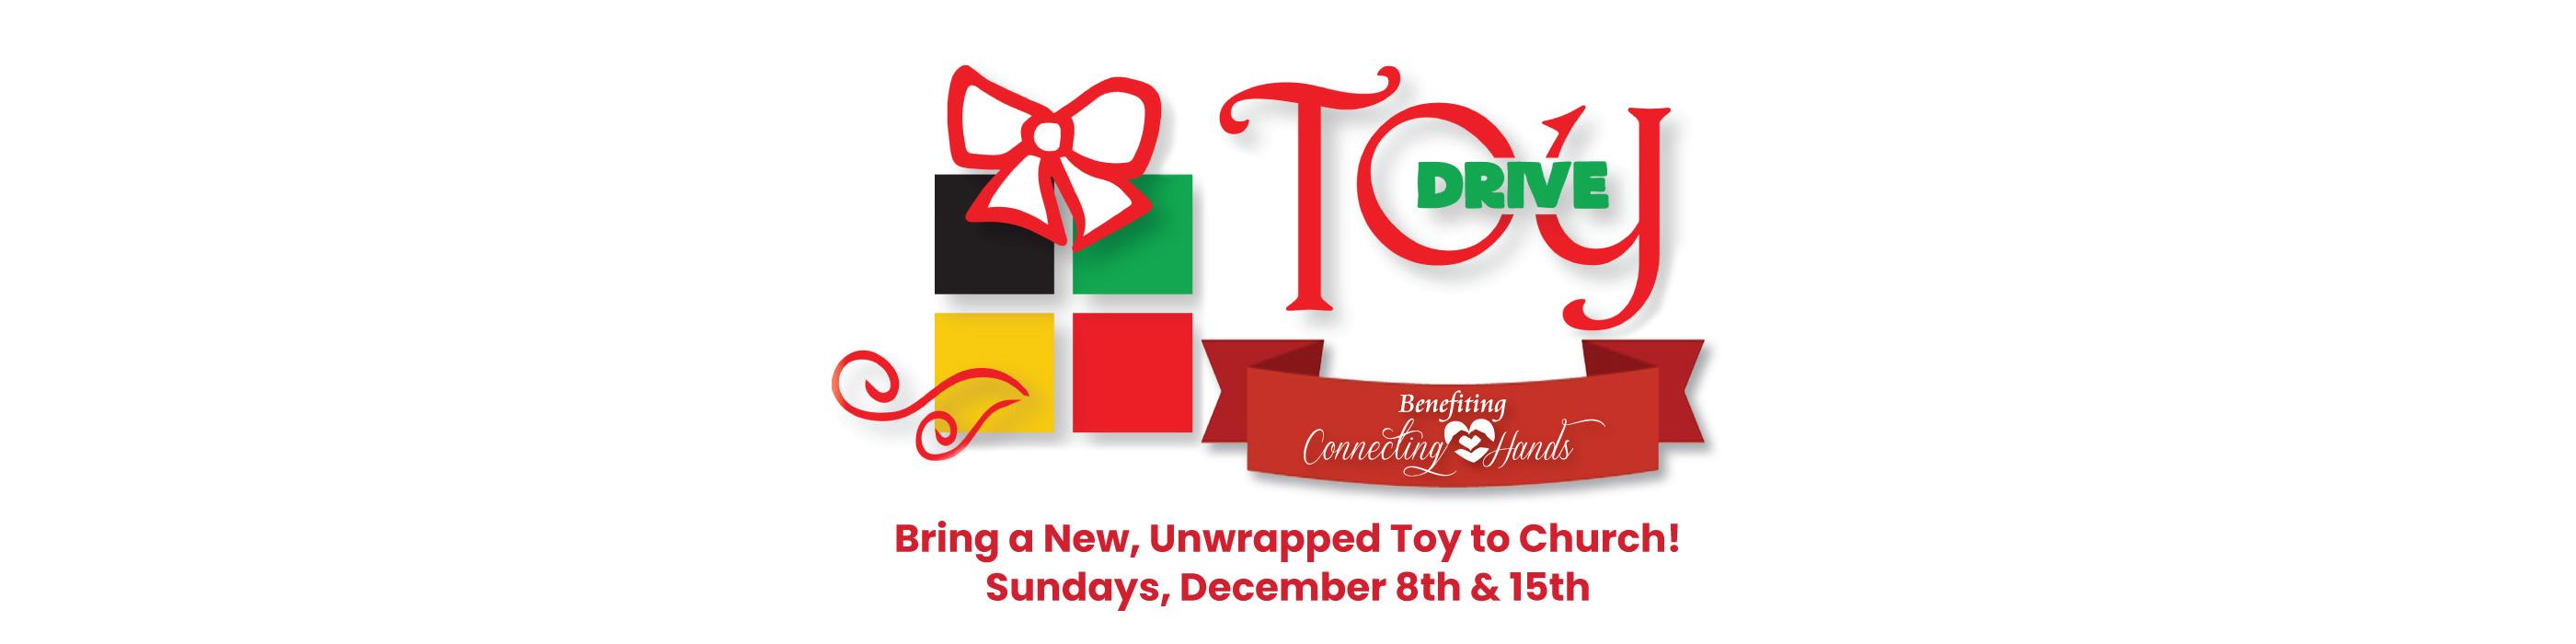 Summit-Christmas-Toy-Drive-1219-WEB-2800x700